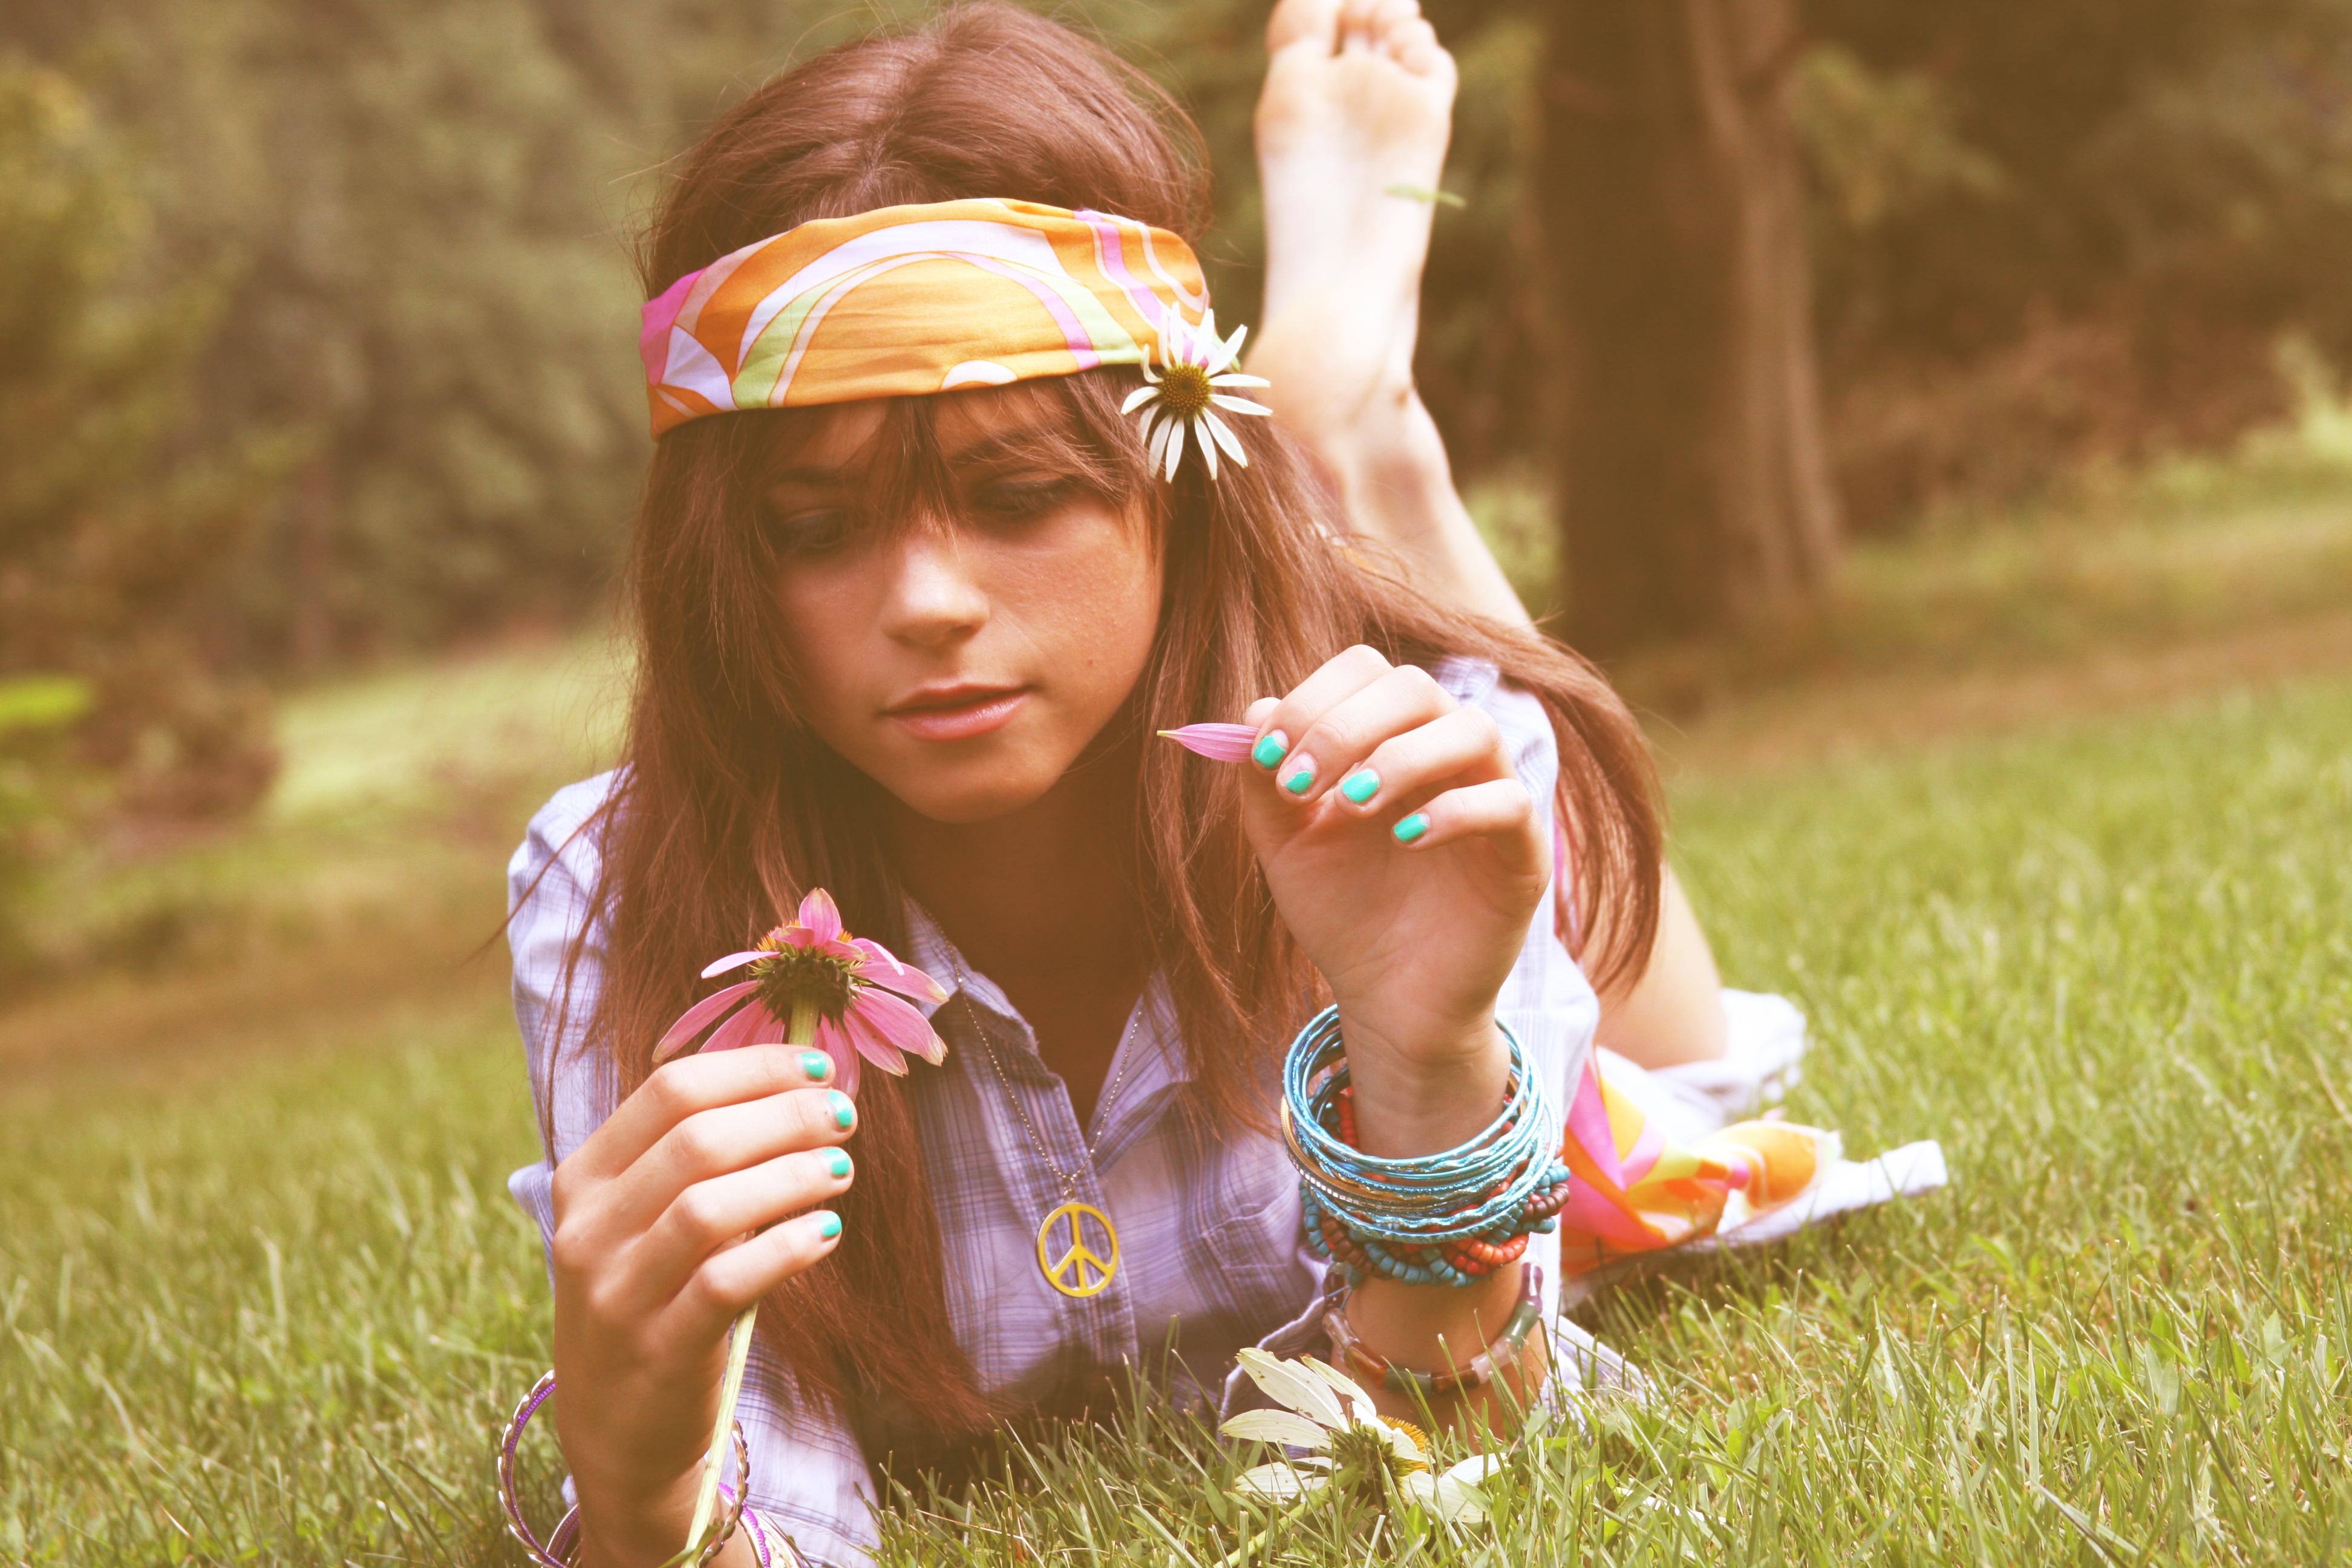 Hippy Girl Erins Photoshoot Inspiration Pinterest